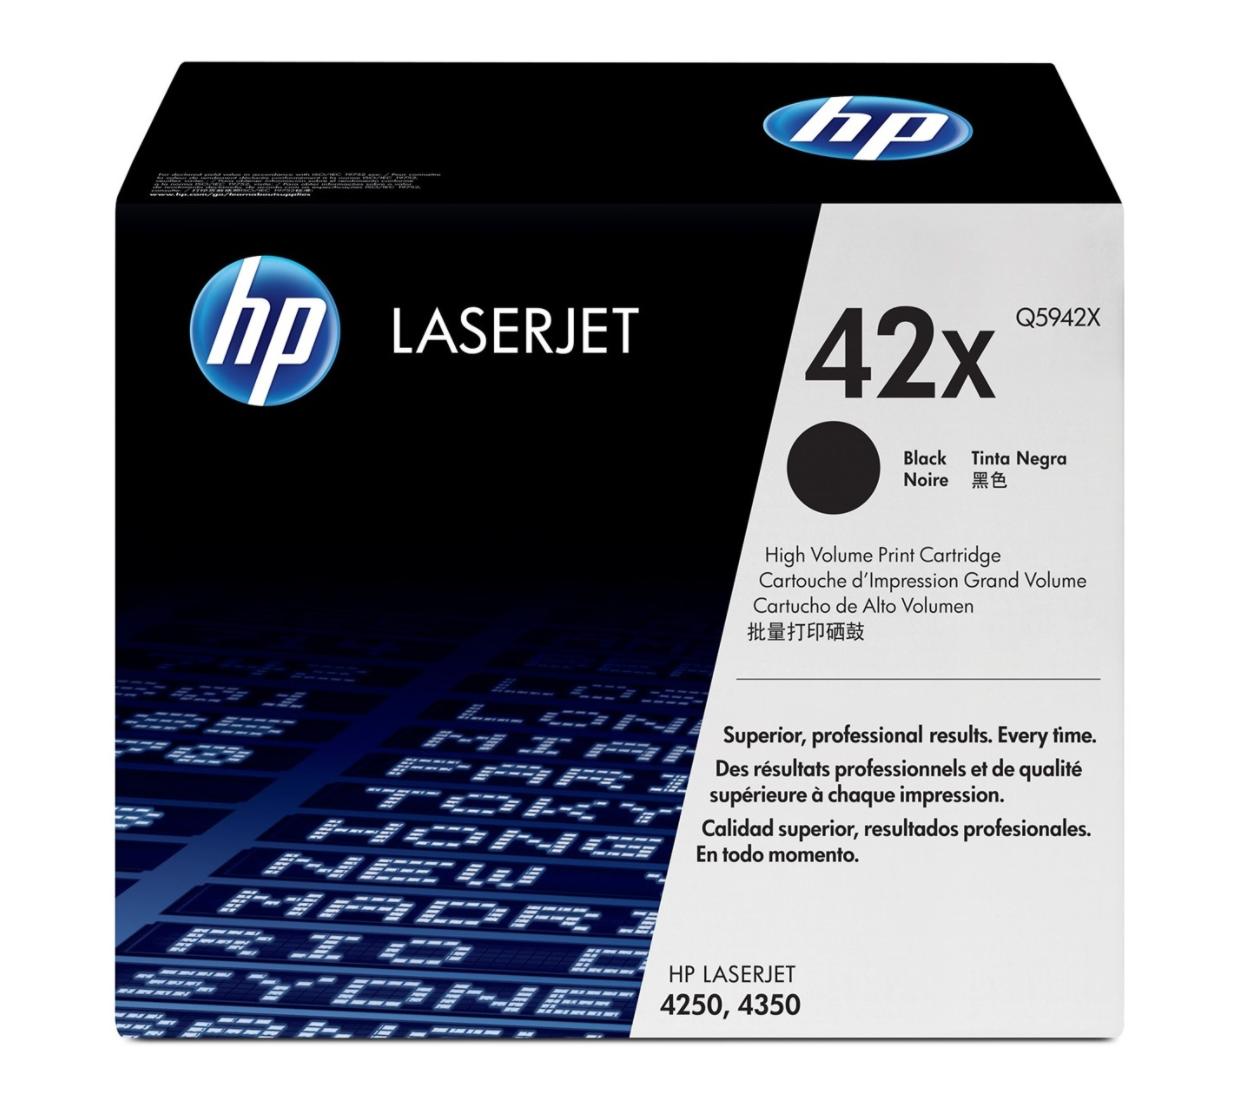 HP 42X 黑色原廠 LaserJet 碳粉Q5942X